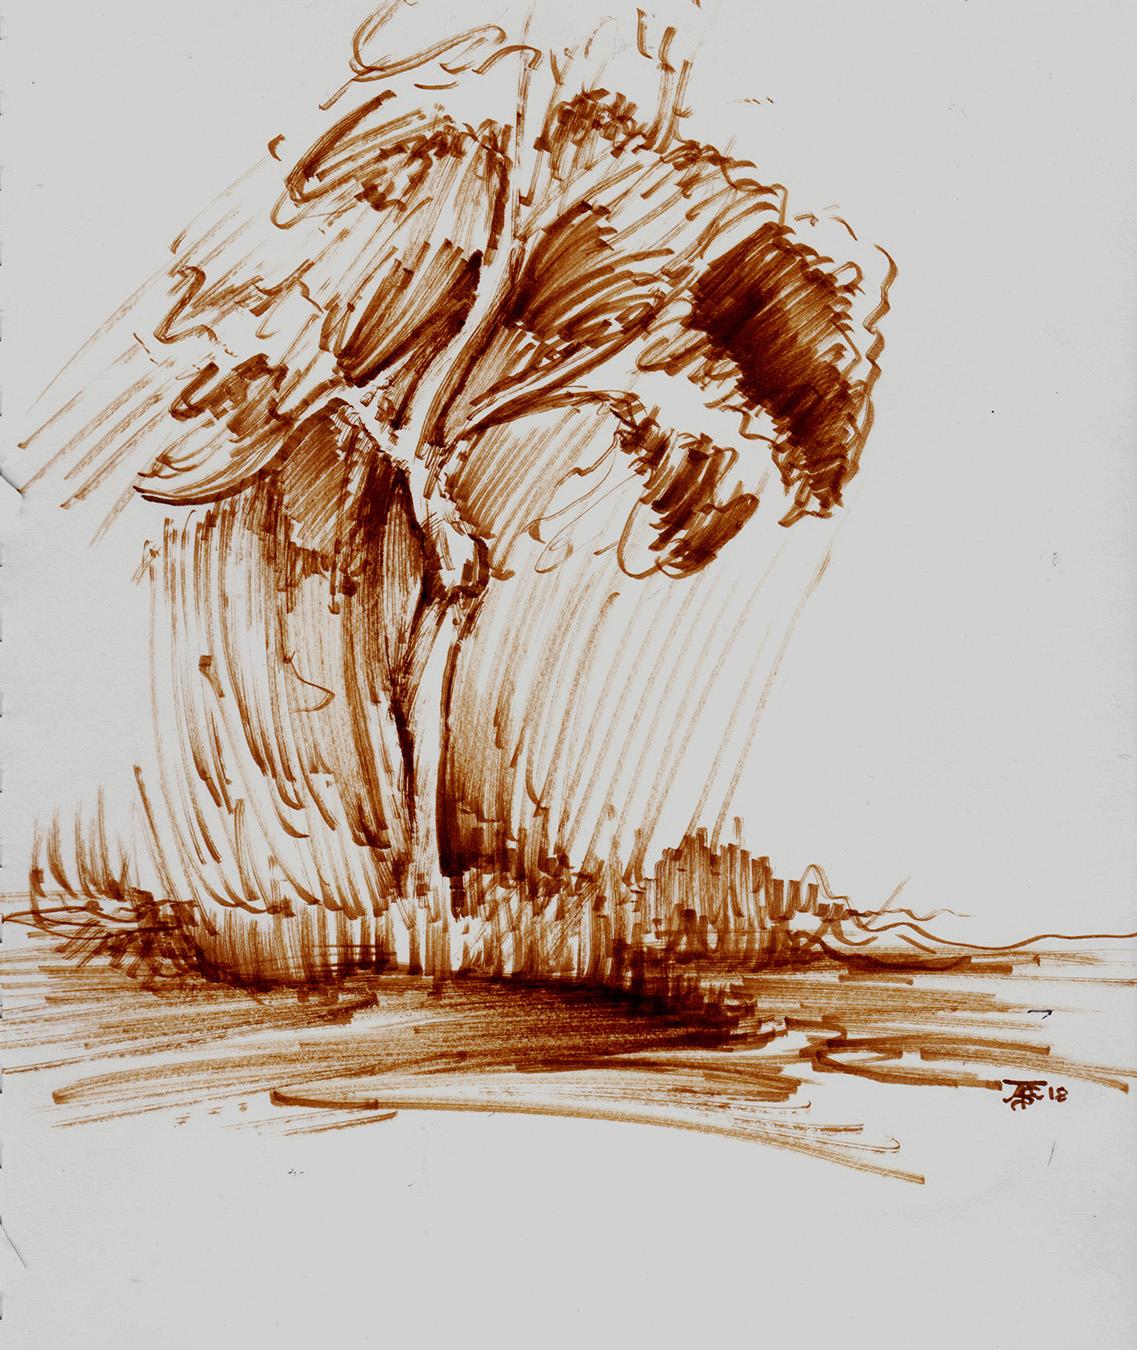 Ansell_Tom_Lone Tree_final version.jpg